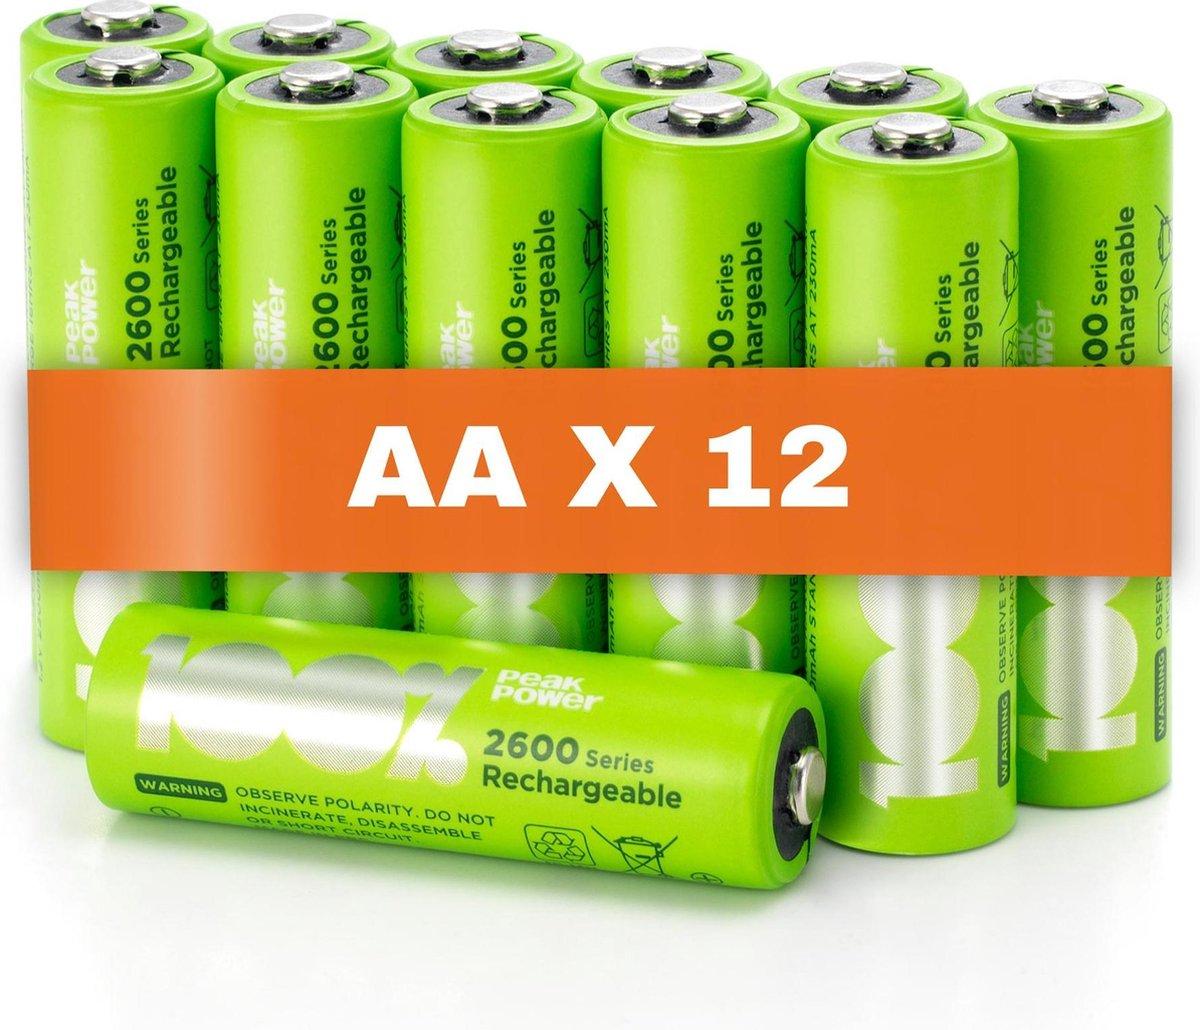 100% Peak Power oplaadbare batterijen AA - Duurzame Keuze - NiMH AA batterij mignon 2300 mAh - 12 st